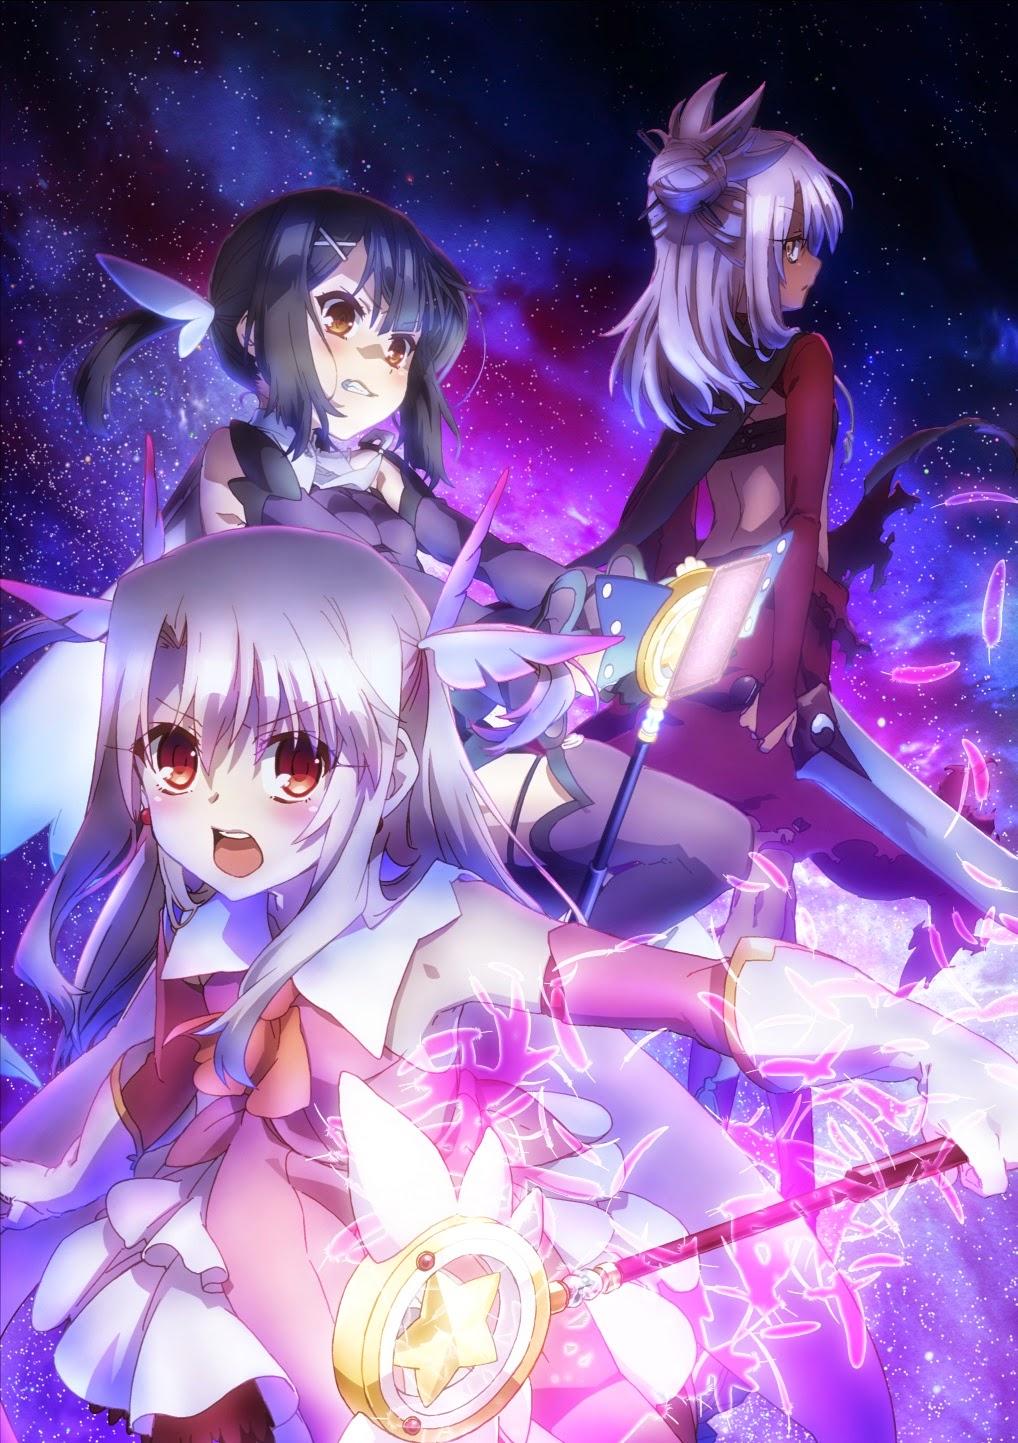 Fate Kaleid Liner Prisma Illya 2wei Ova Special 720p